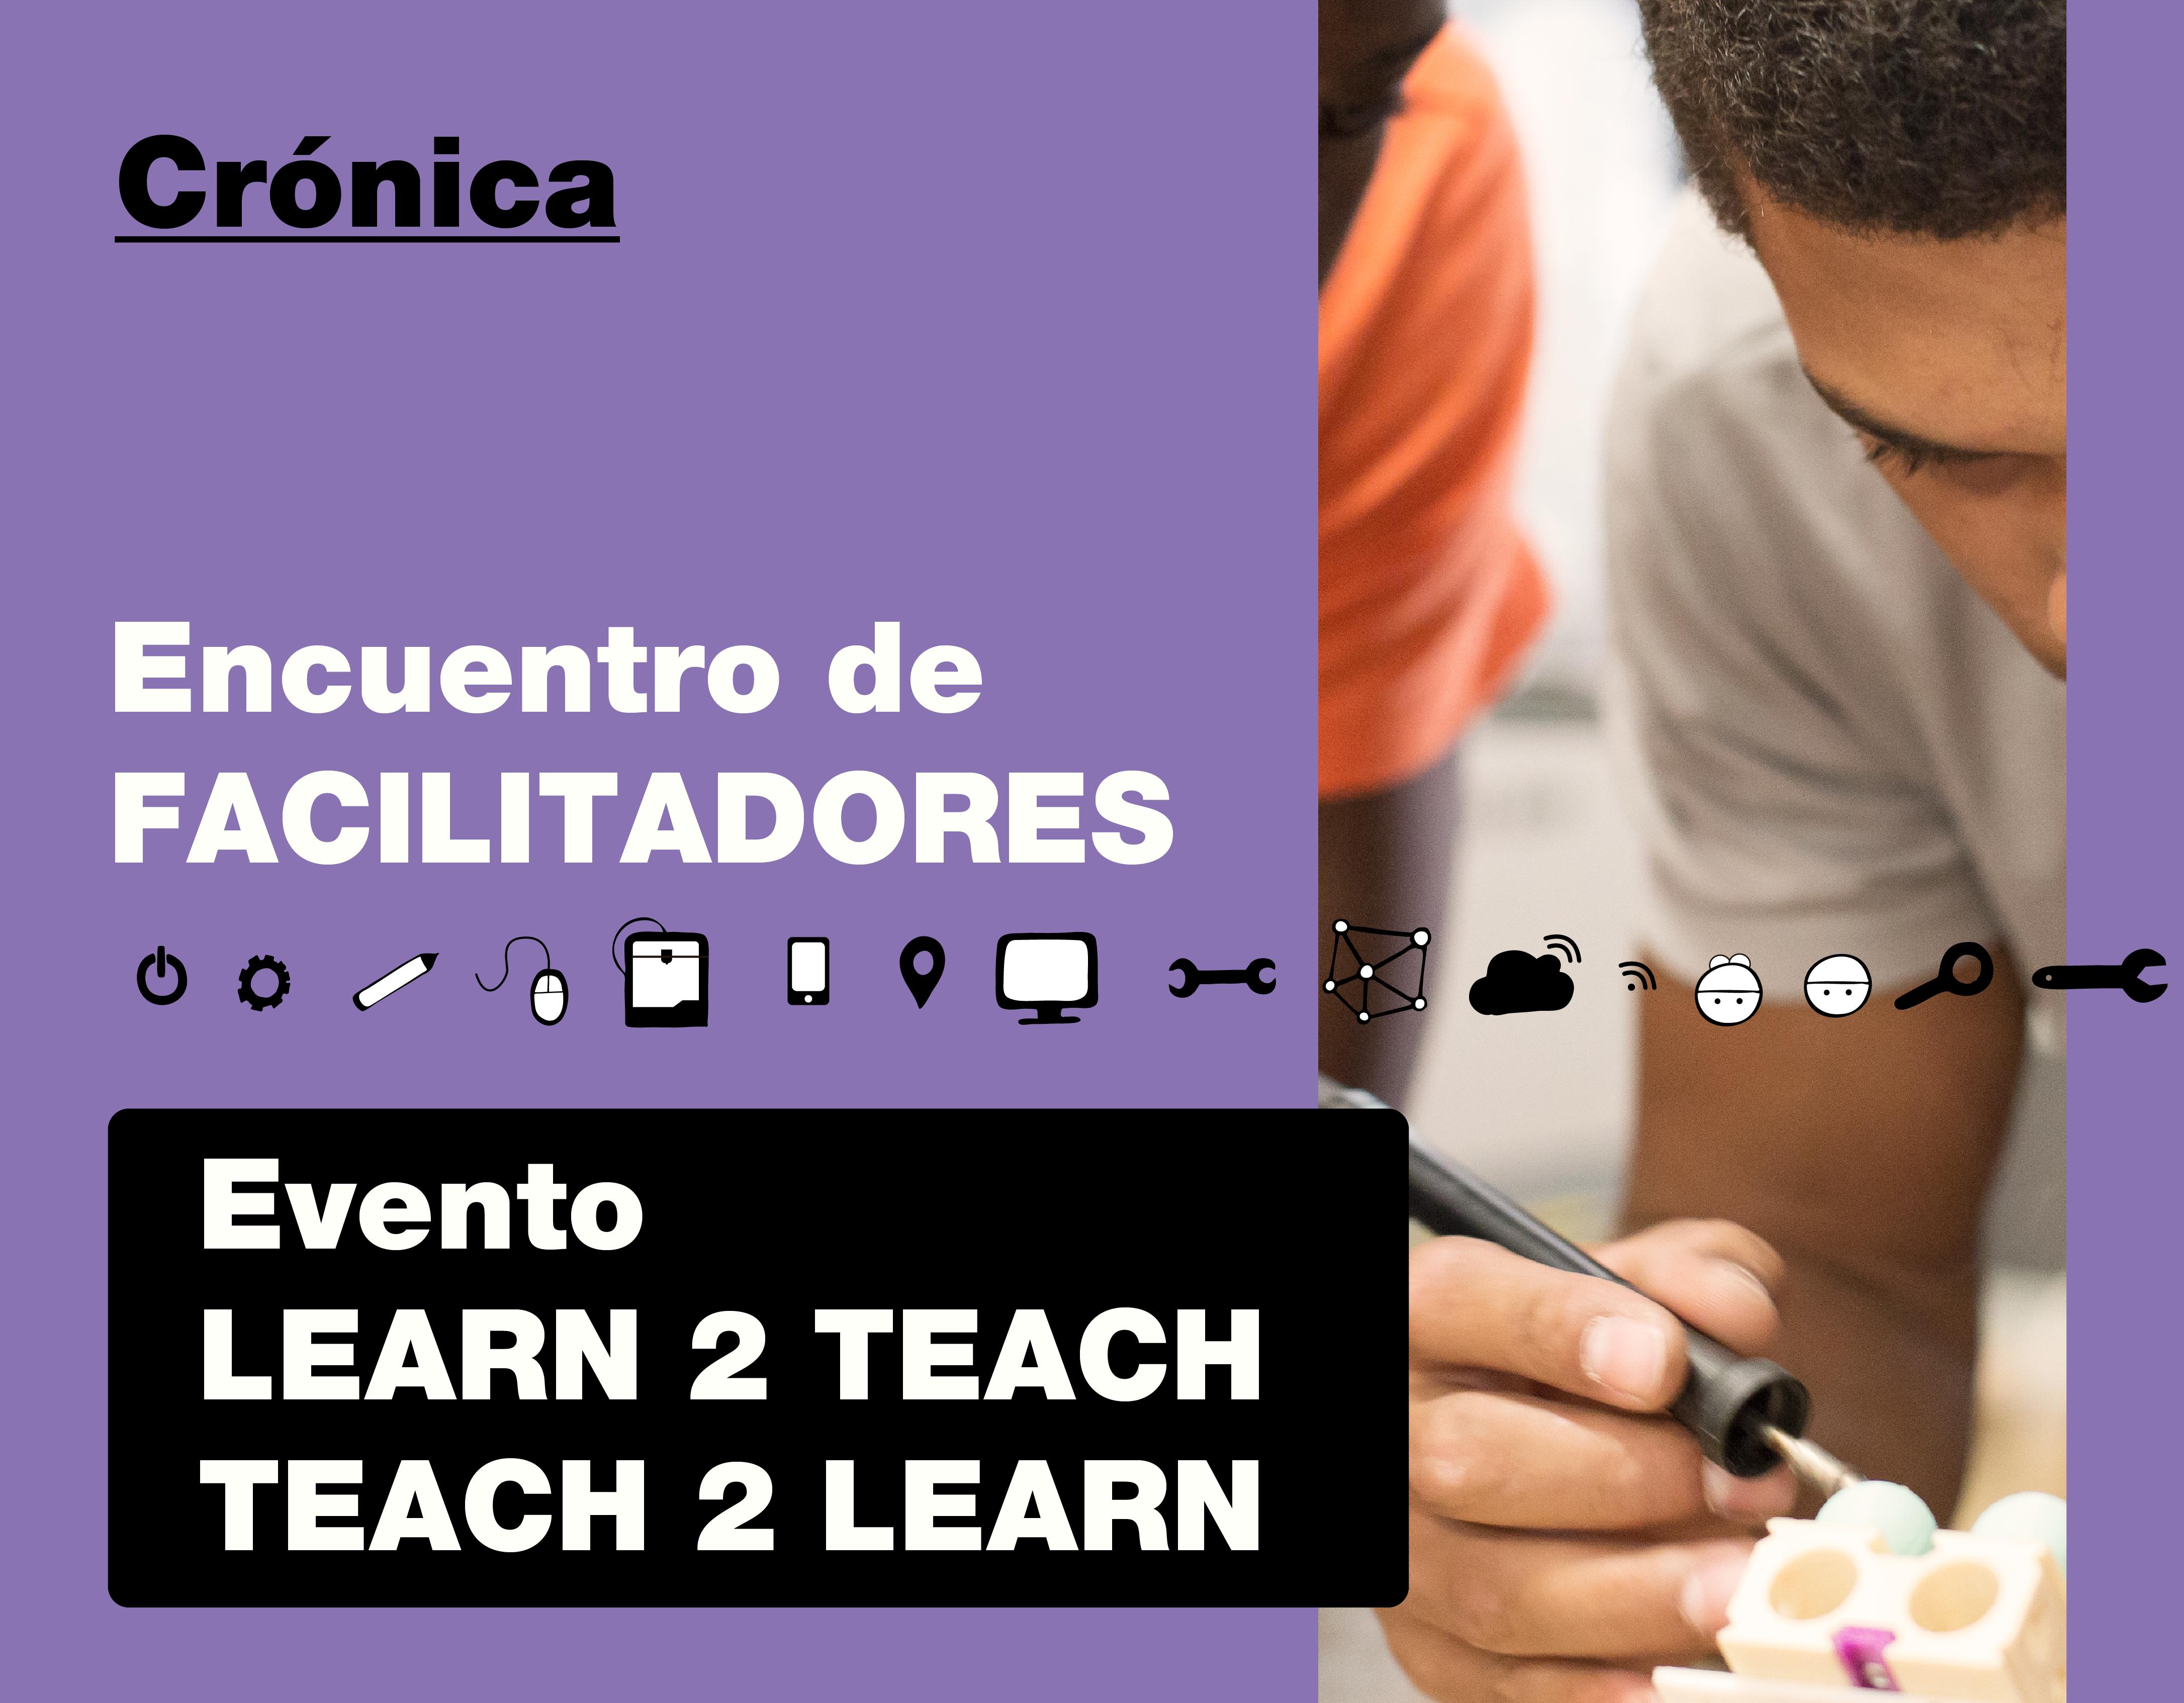 Crónica del evento para facilitadores y evento Learn 2 Teach